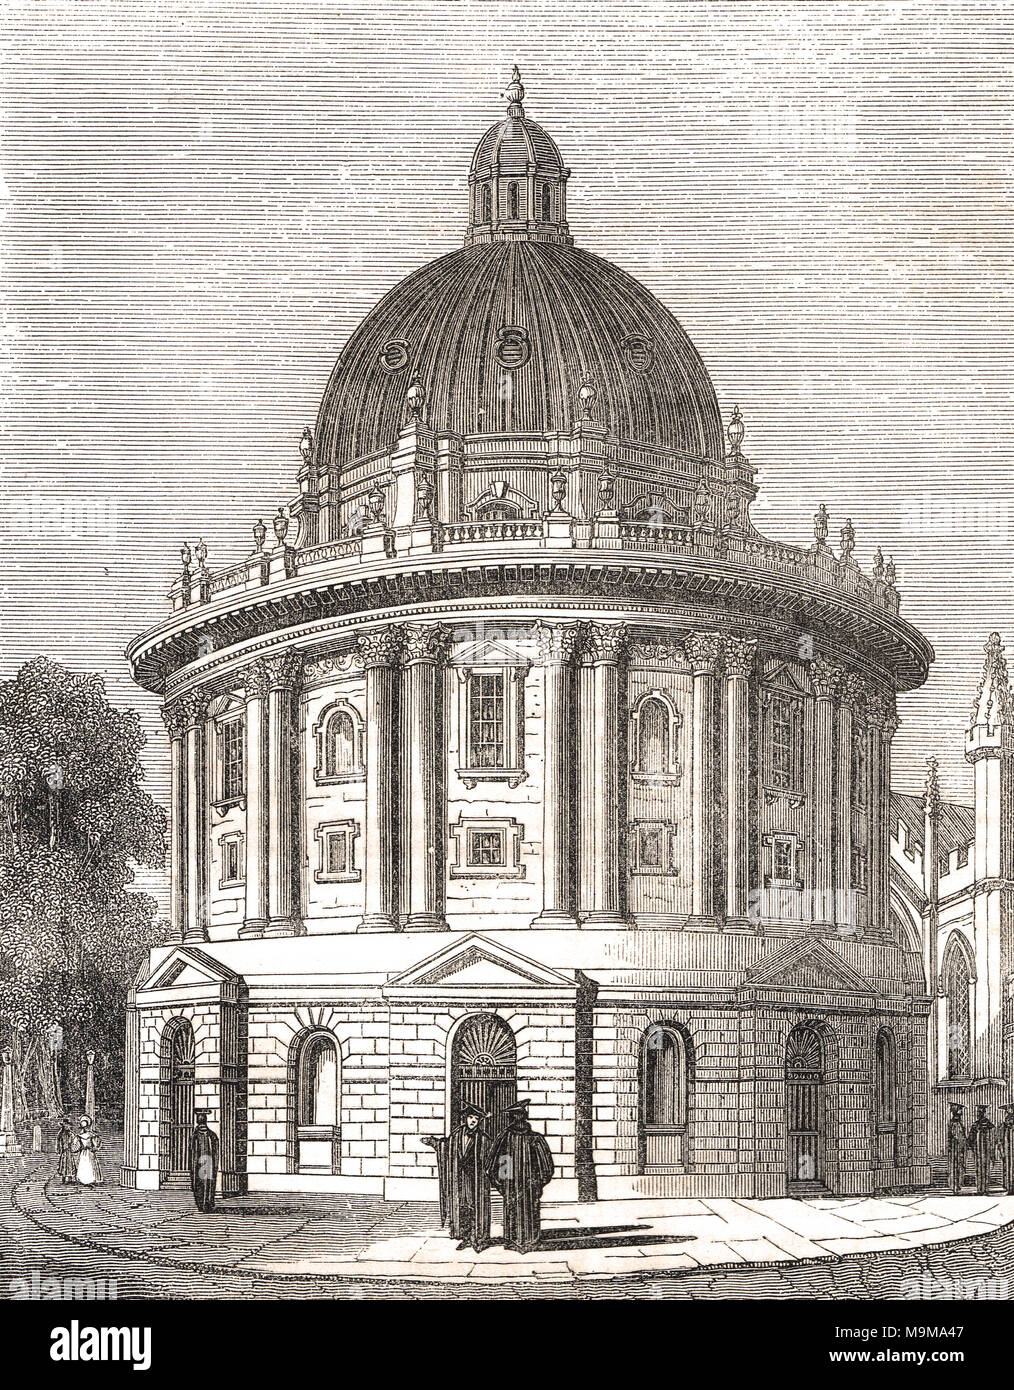 Radcliffe camera, Radcliffe Square, Oxford, England, 19th century scene - Stock Image